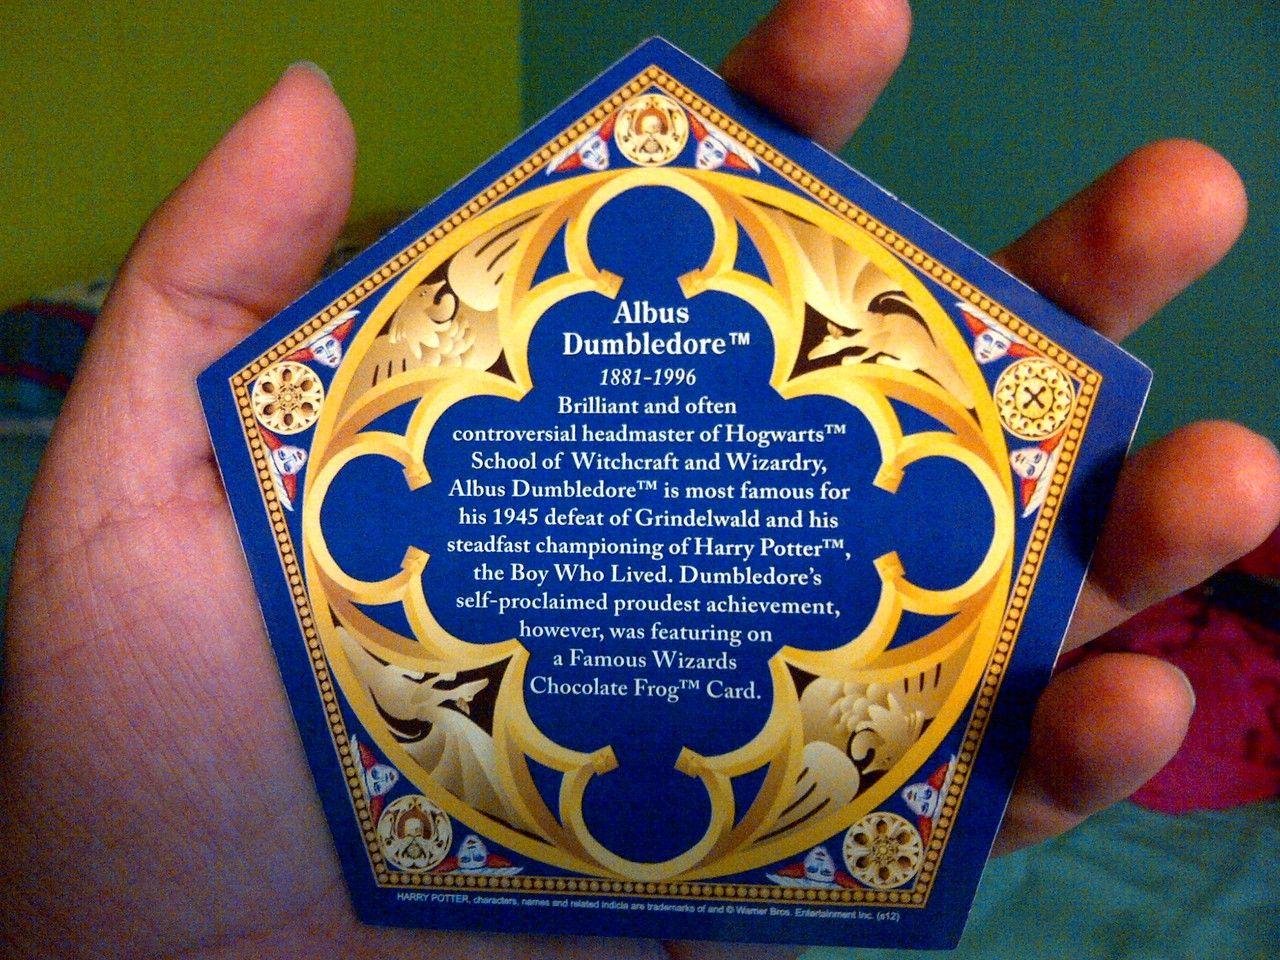 Random Things I Facny My Albus Dumbledore Chocolate Frog Card Harry Potter Printables Albus Dumbledore Dumbledore